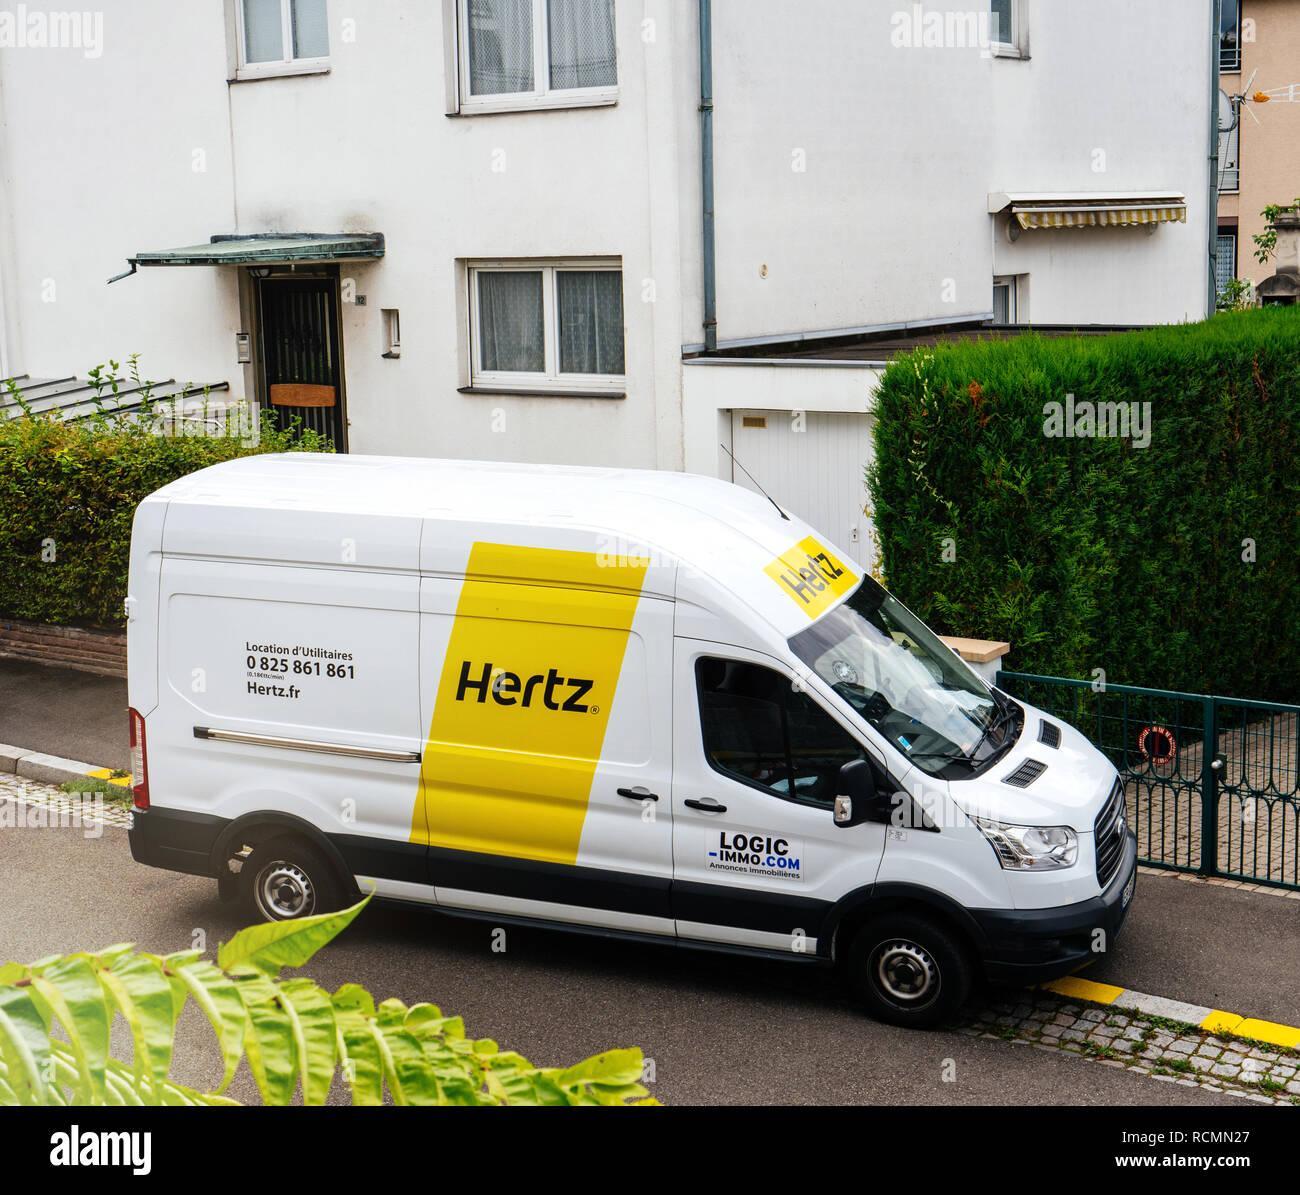 Parigi, Francia - Sep 13, 2017: Bianco HERTZ RENT A van service visto dal di sopra su una strada francese nei pressi di una casa Immagini Stock